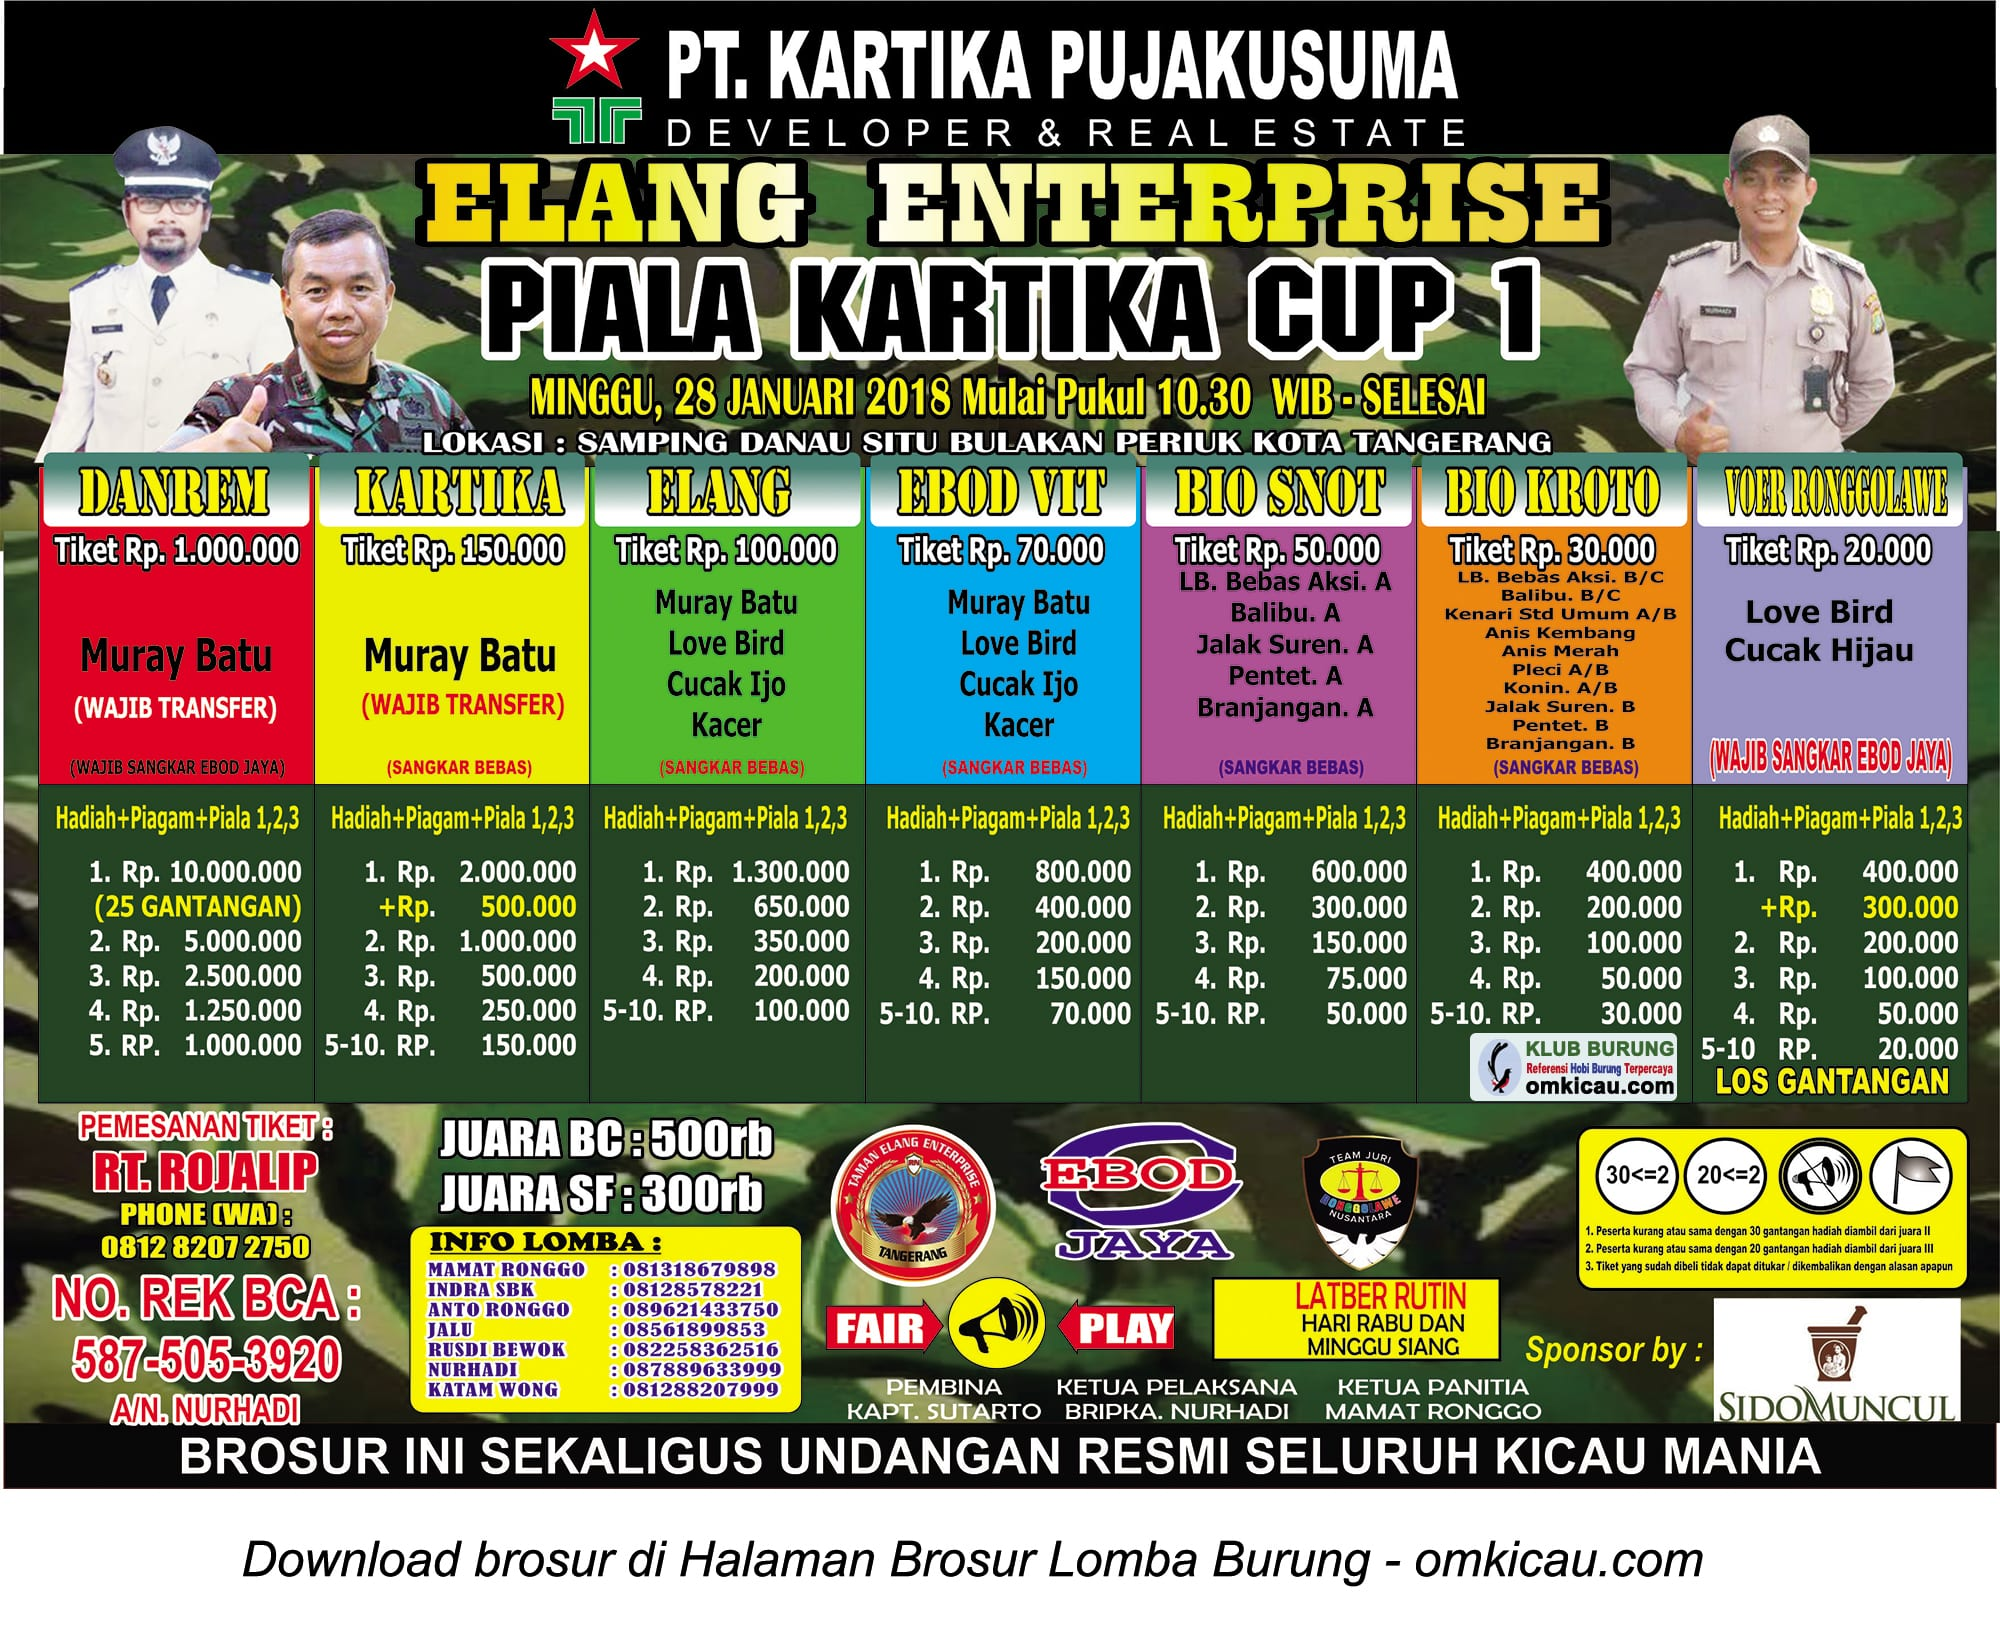 Piala Kartika Cup 1